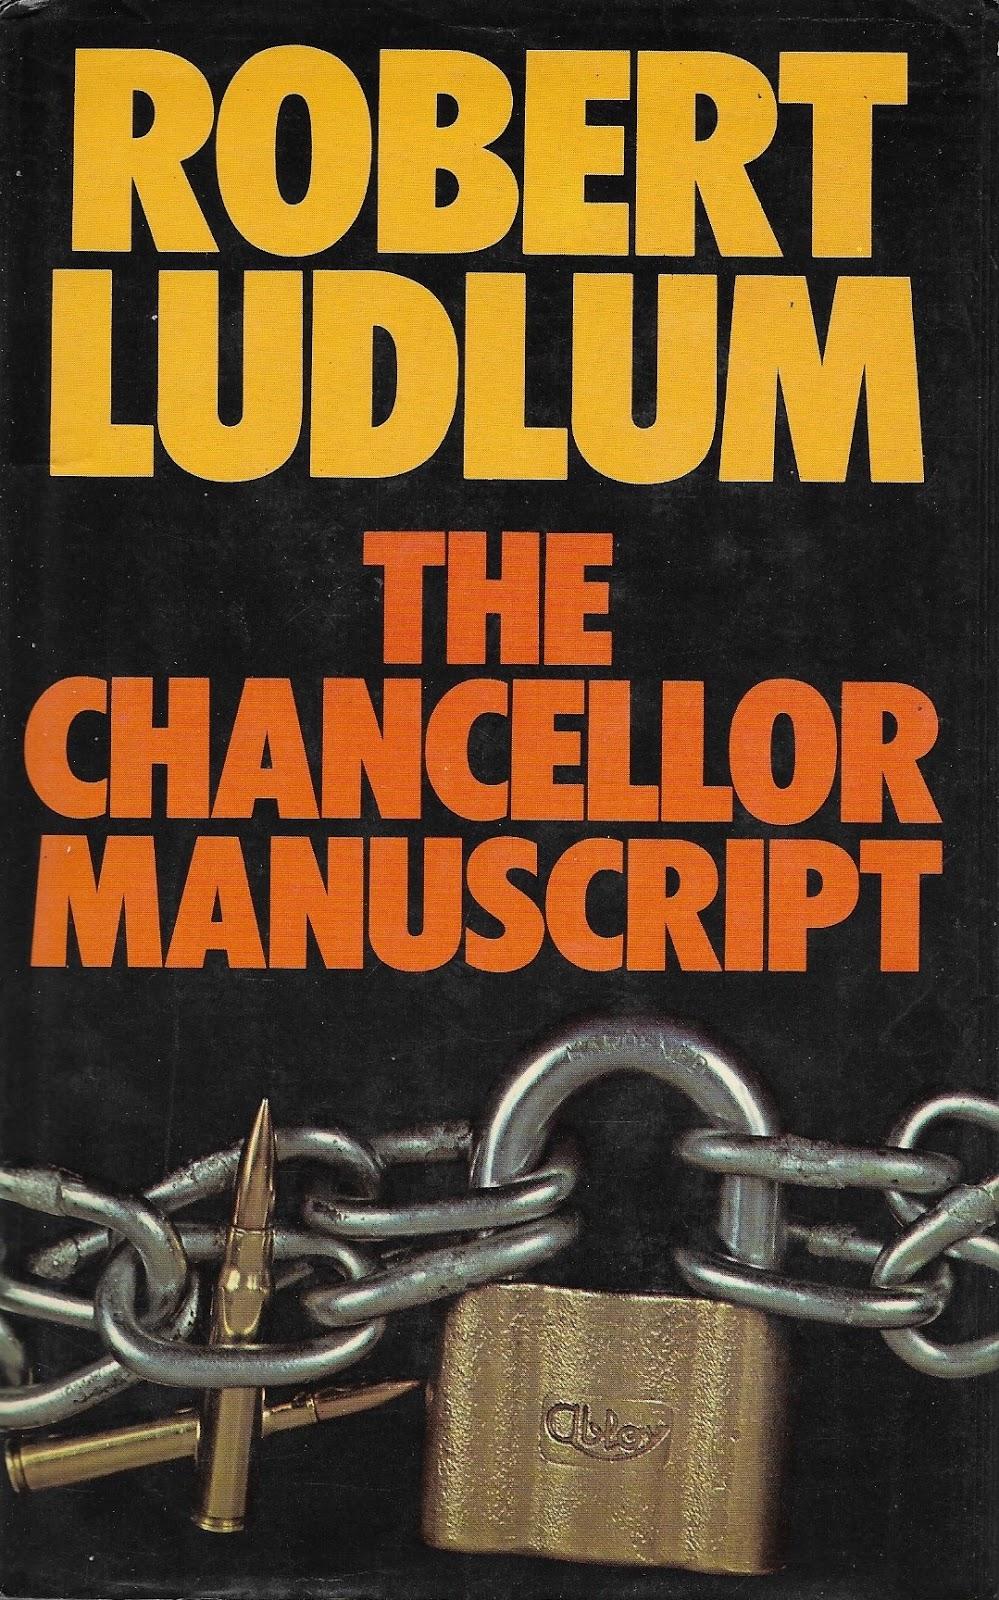 Роберт Ладлэм — Рукопись Ченселора (1977)